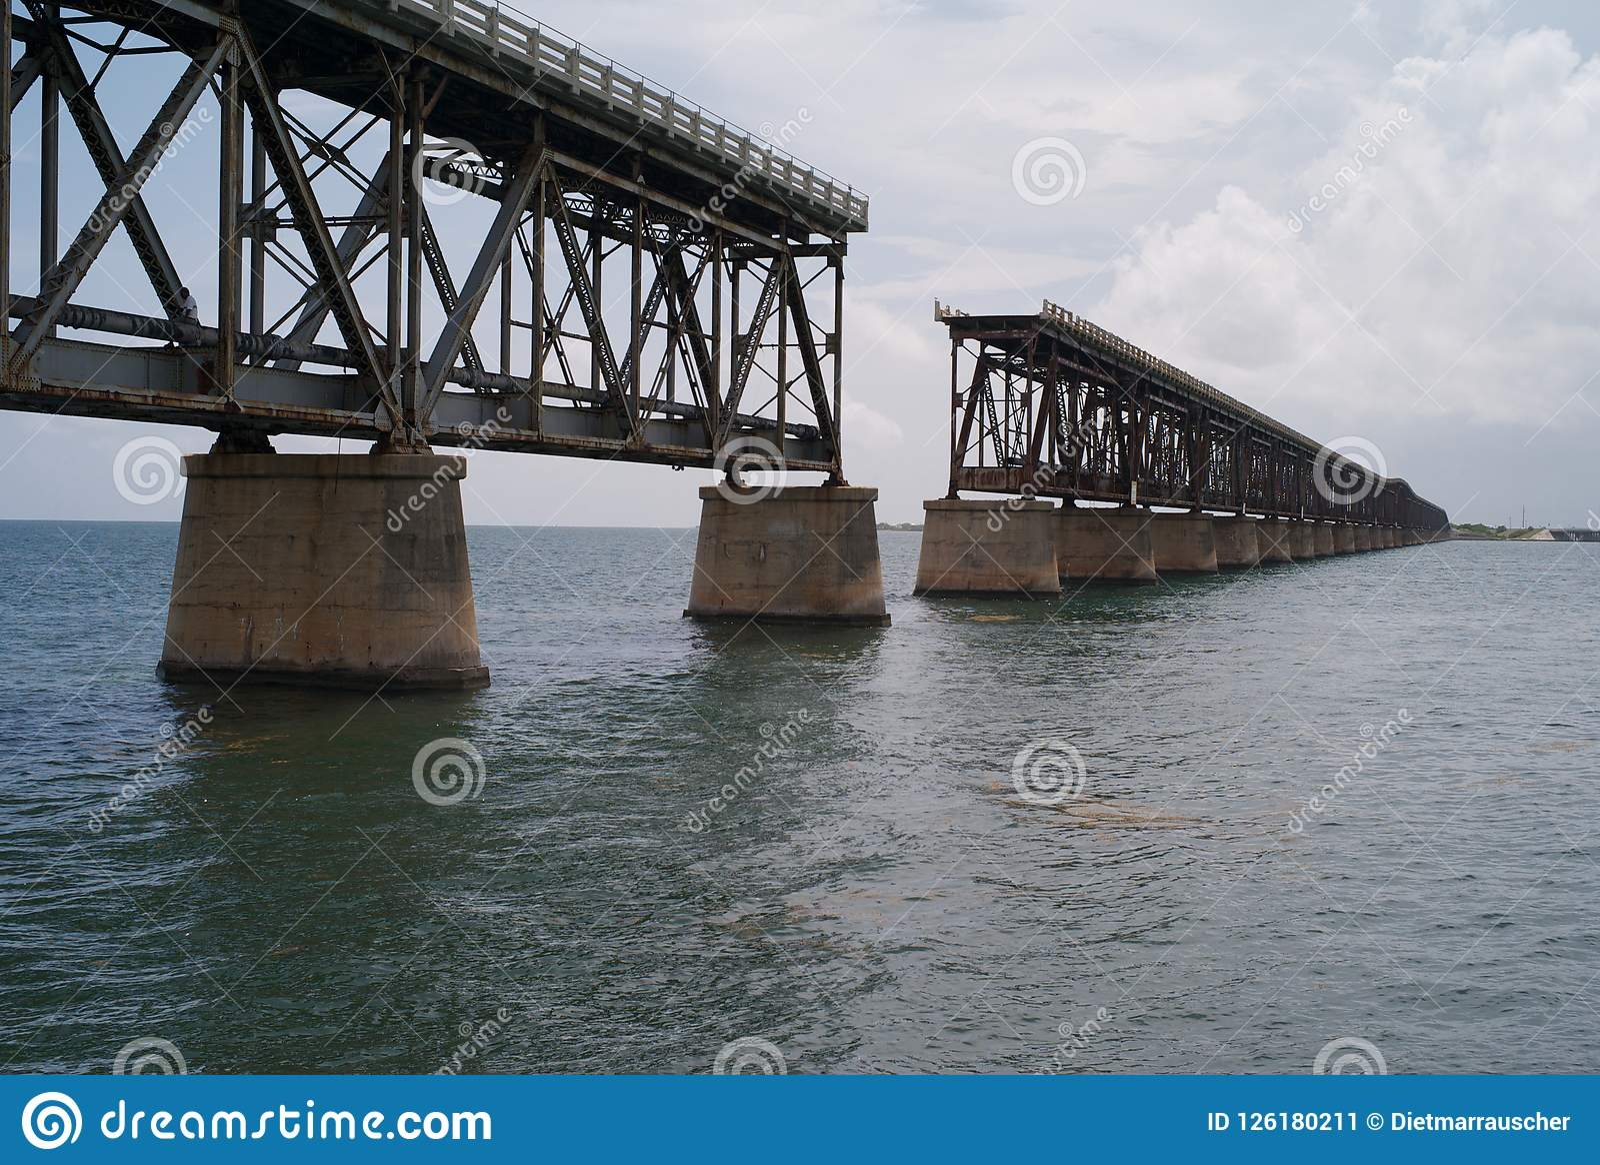 A Derelict Railroad Bridge